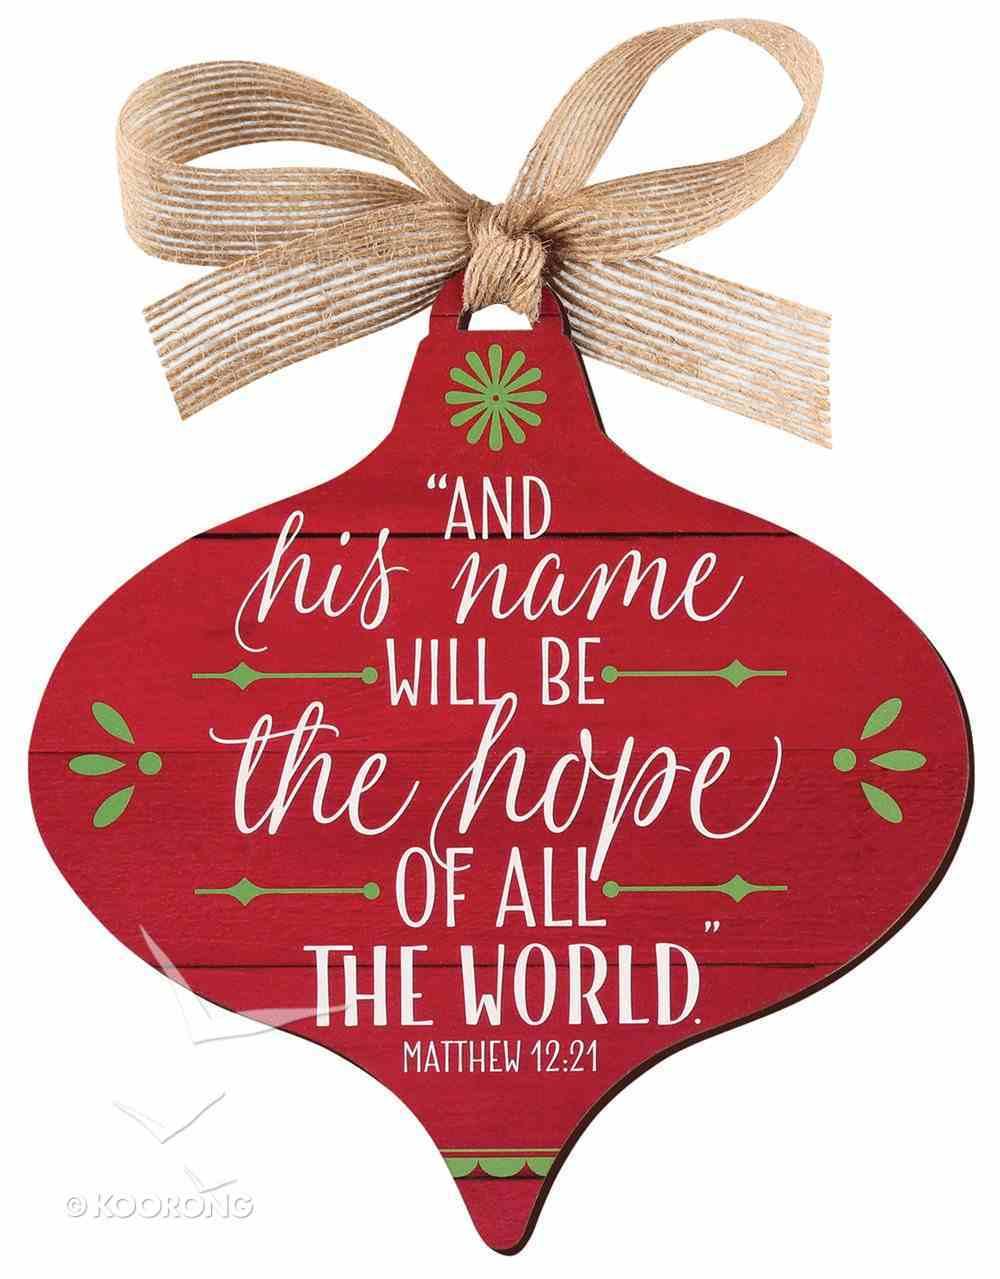 Christmas Mdf Red Barnwood Ornament: Hope, Wide Teardrop Shape (Matthew 12:21) Homeware